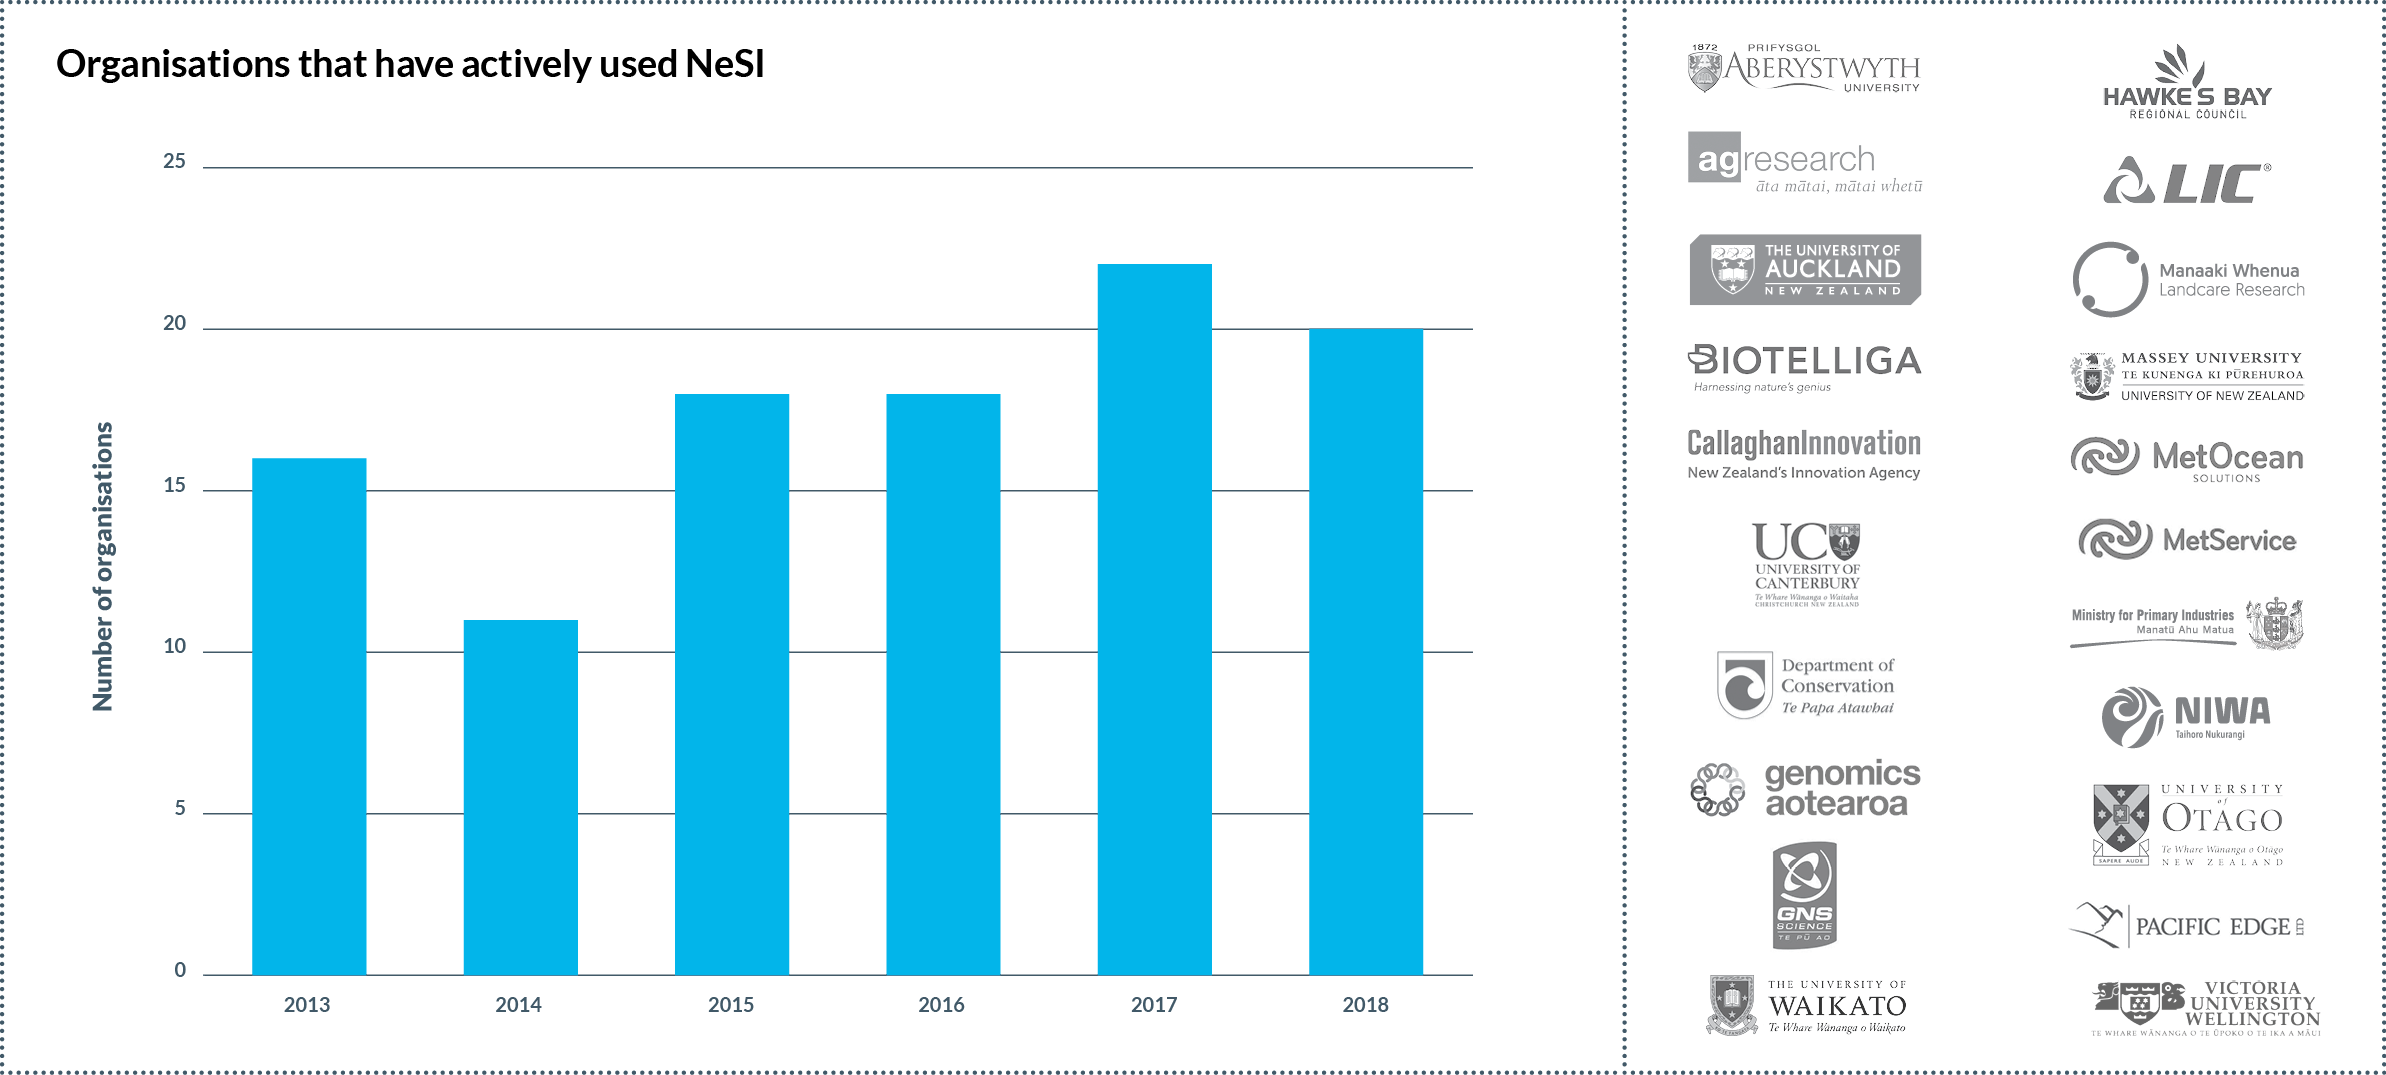 NeSI organisation users 2018